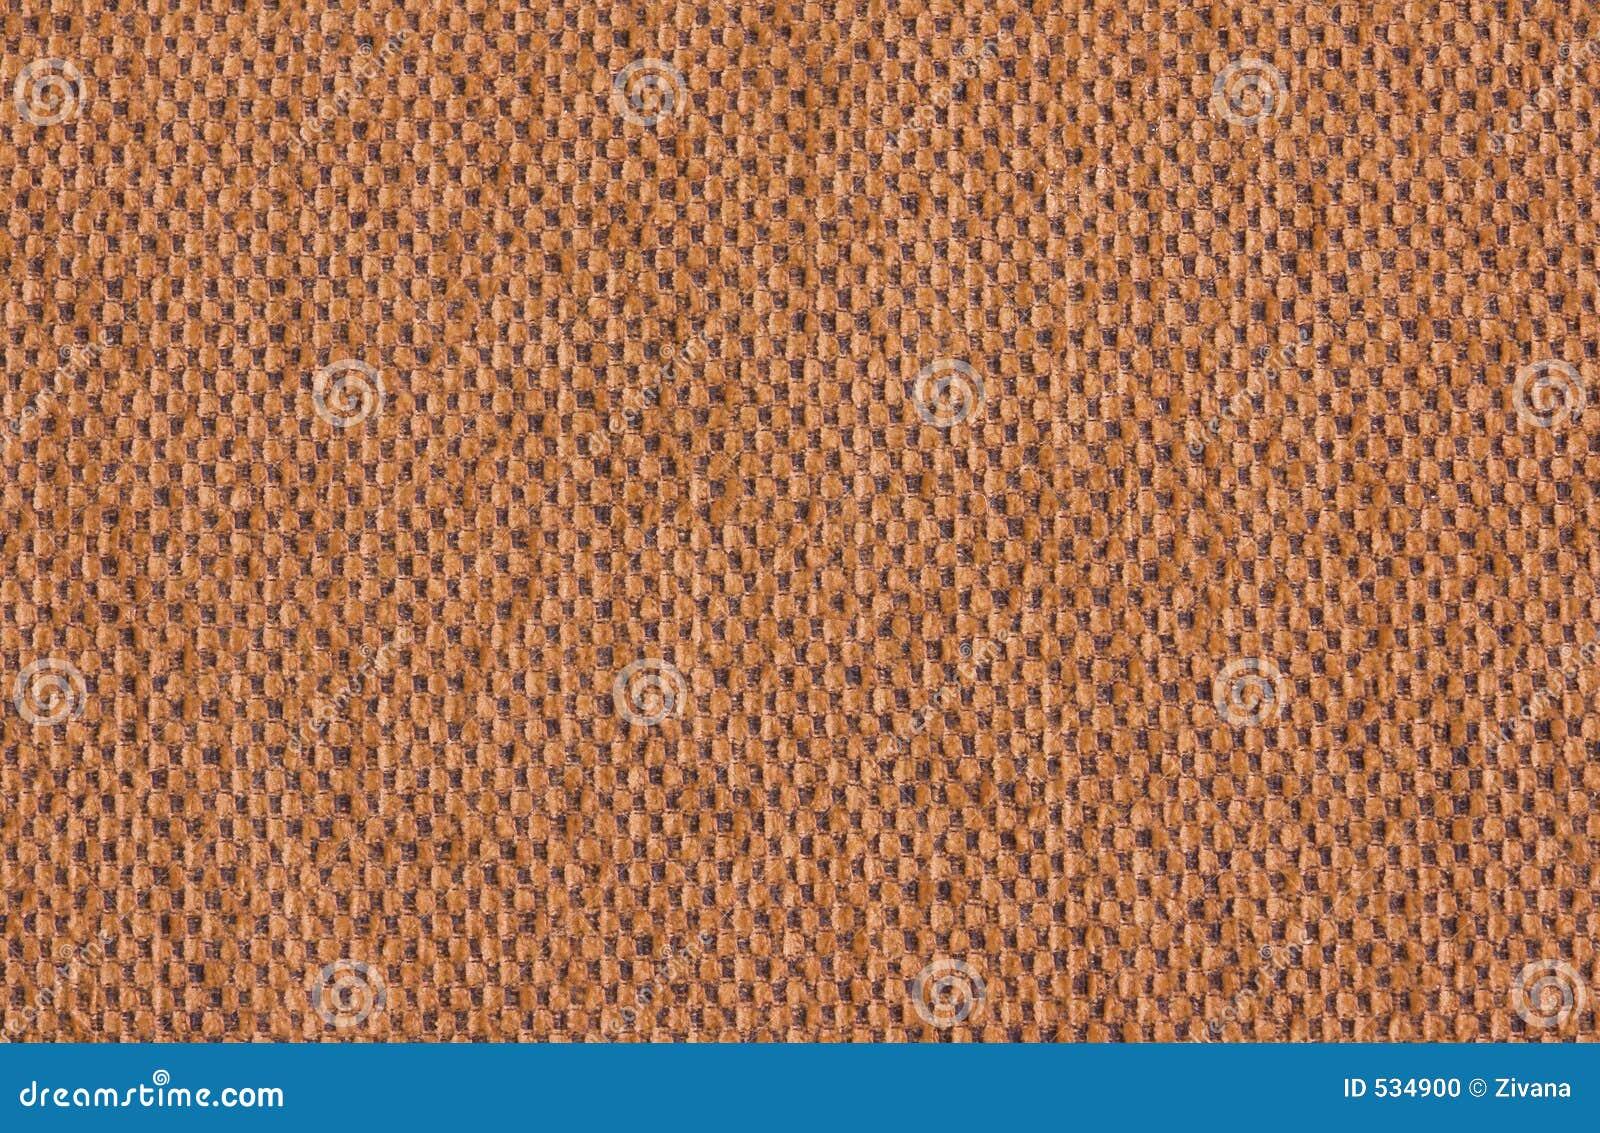 Download 织品微型方形纹理 库存照片. 图片 包括有 席子, 纹理, 模式, 正方形, 织法, 打褶, 线路, 宏指令 - 534900